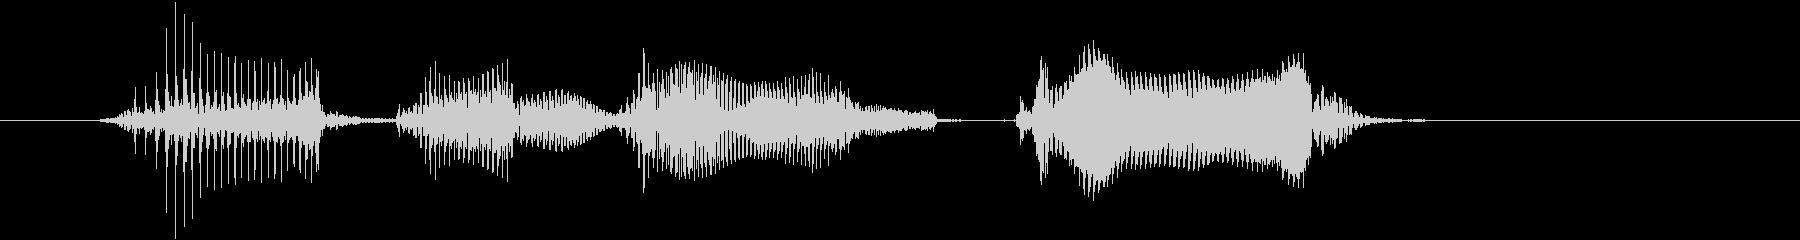 「Happy birthday」英語発音の未再生の波形